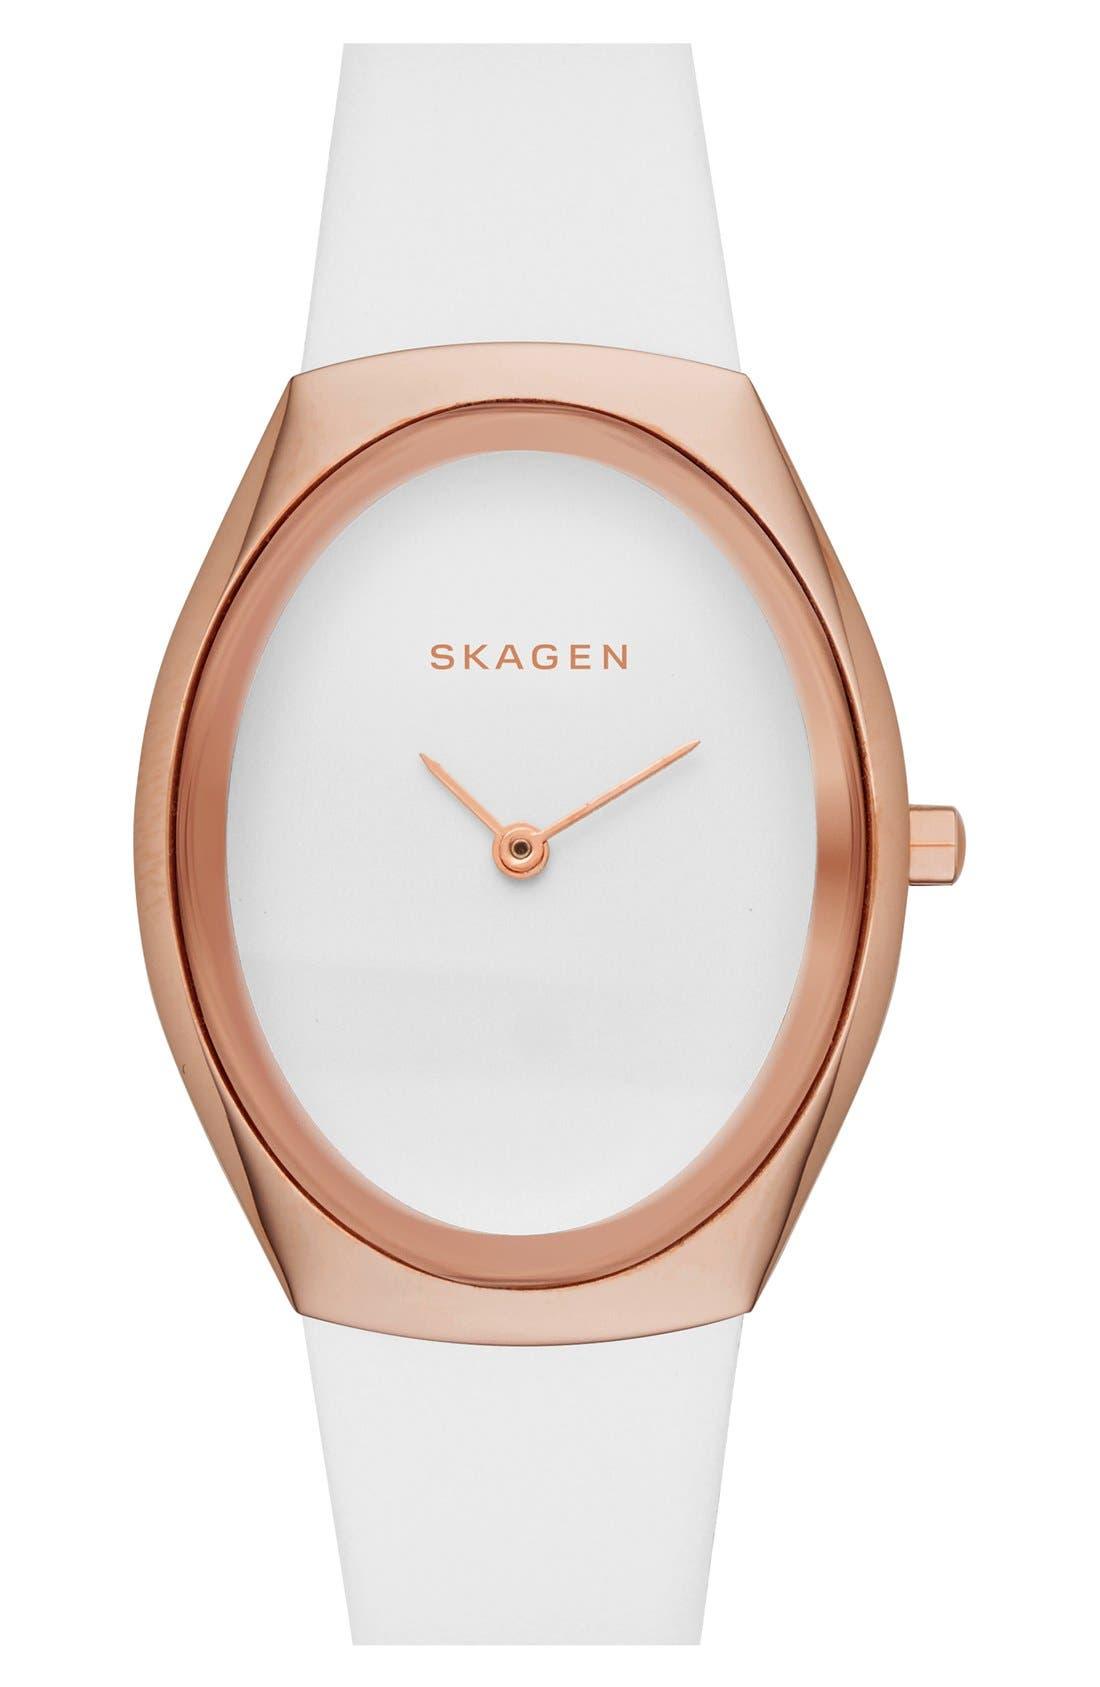 Alternate Image 1 Selected - Skagen 'Madsen' Barrel Leather Strap Watch, 27mm